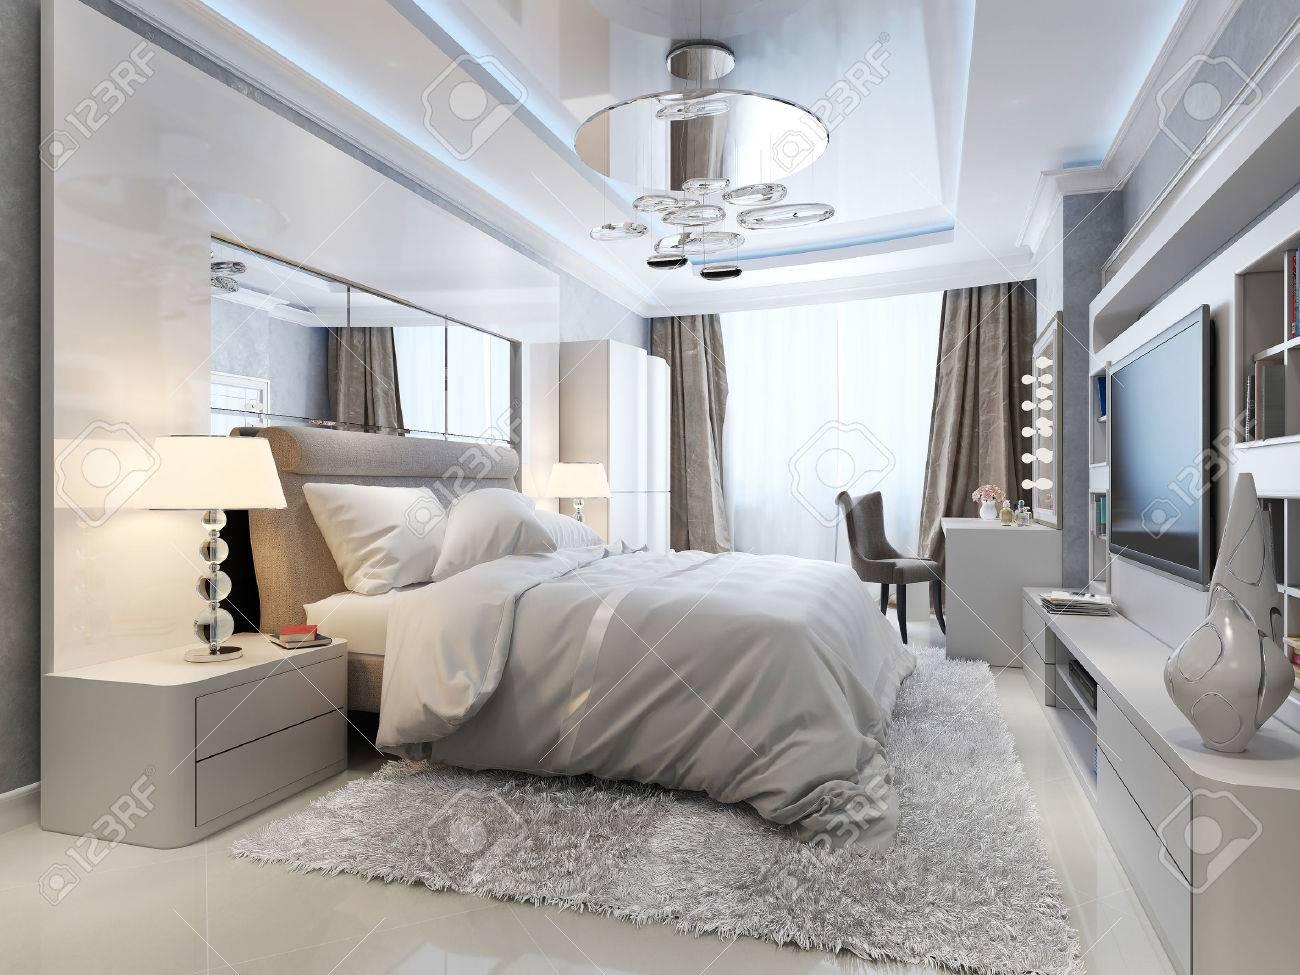 Bedroom art deco style, 3d picture